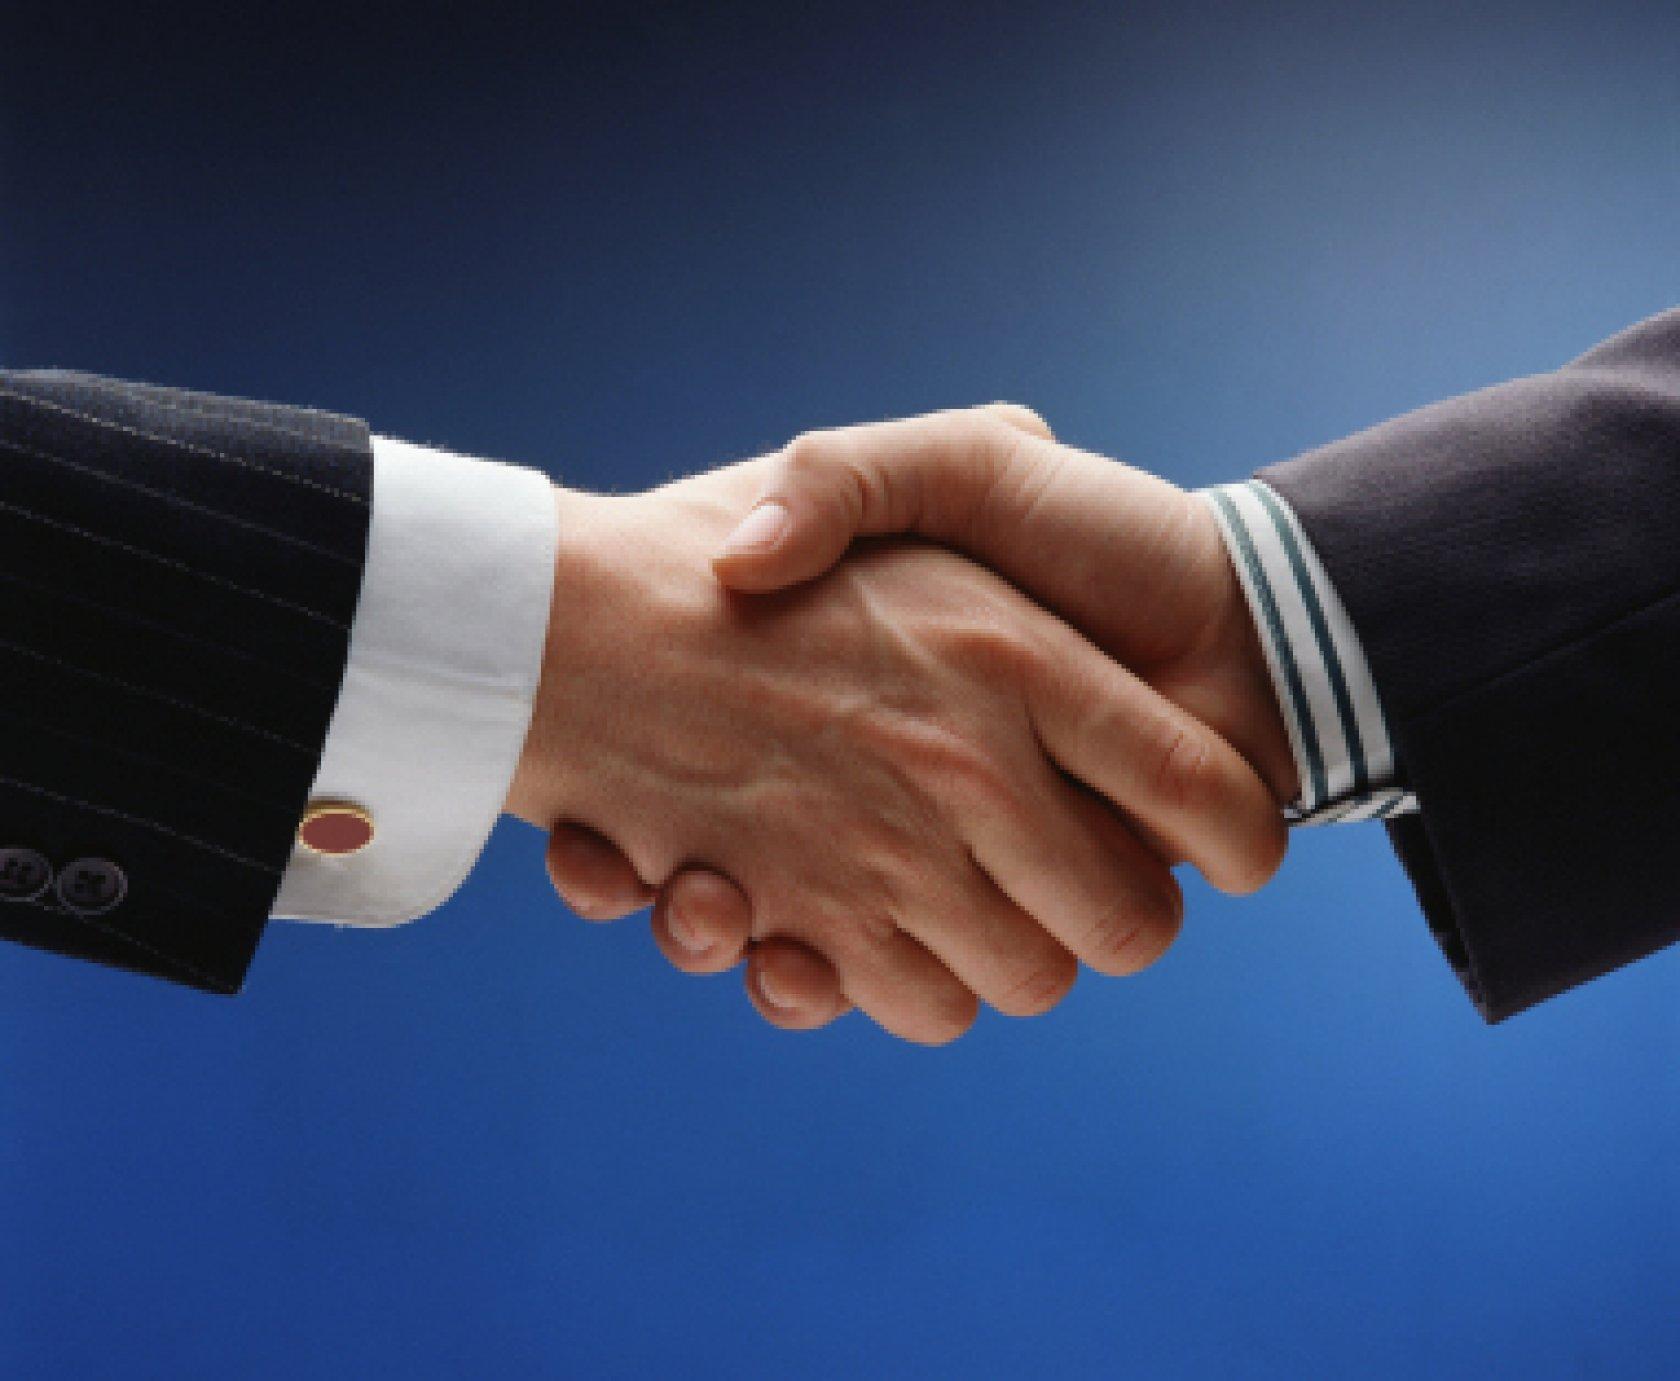 dolan-family-buys-data-analytics-firm-fusion-analytics-world